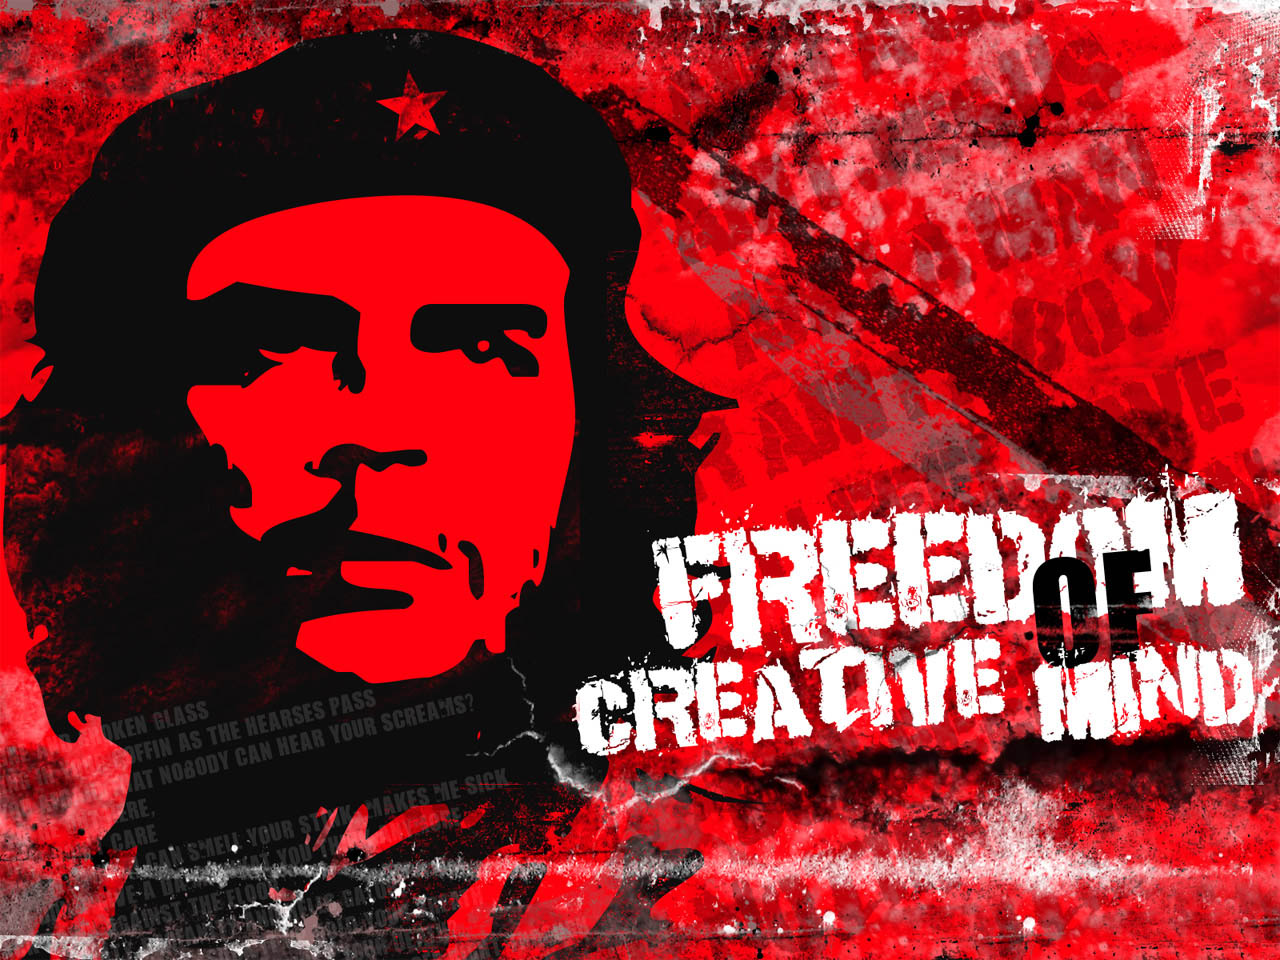 Che Guevara Wallpapers 1280x960